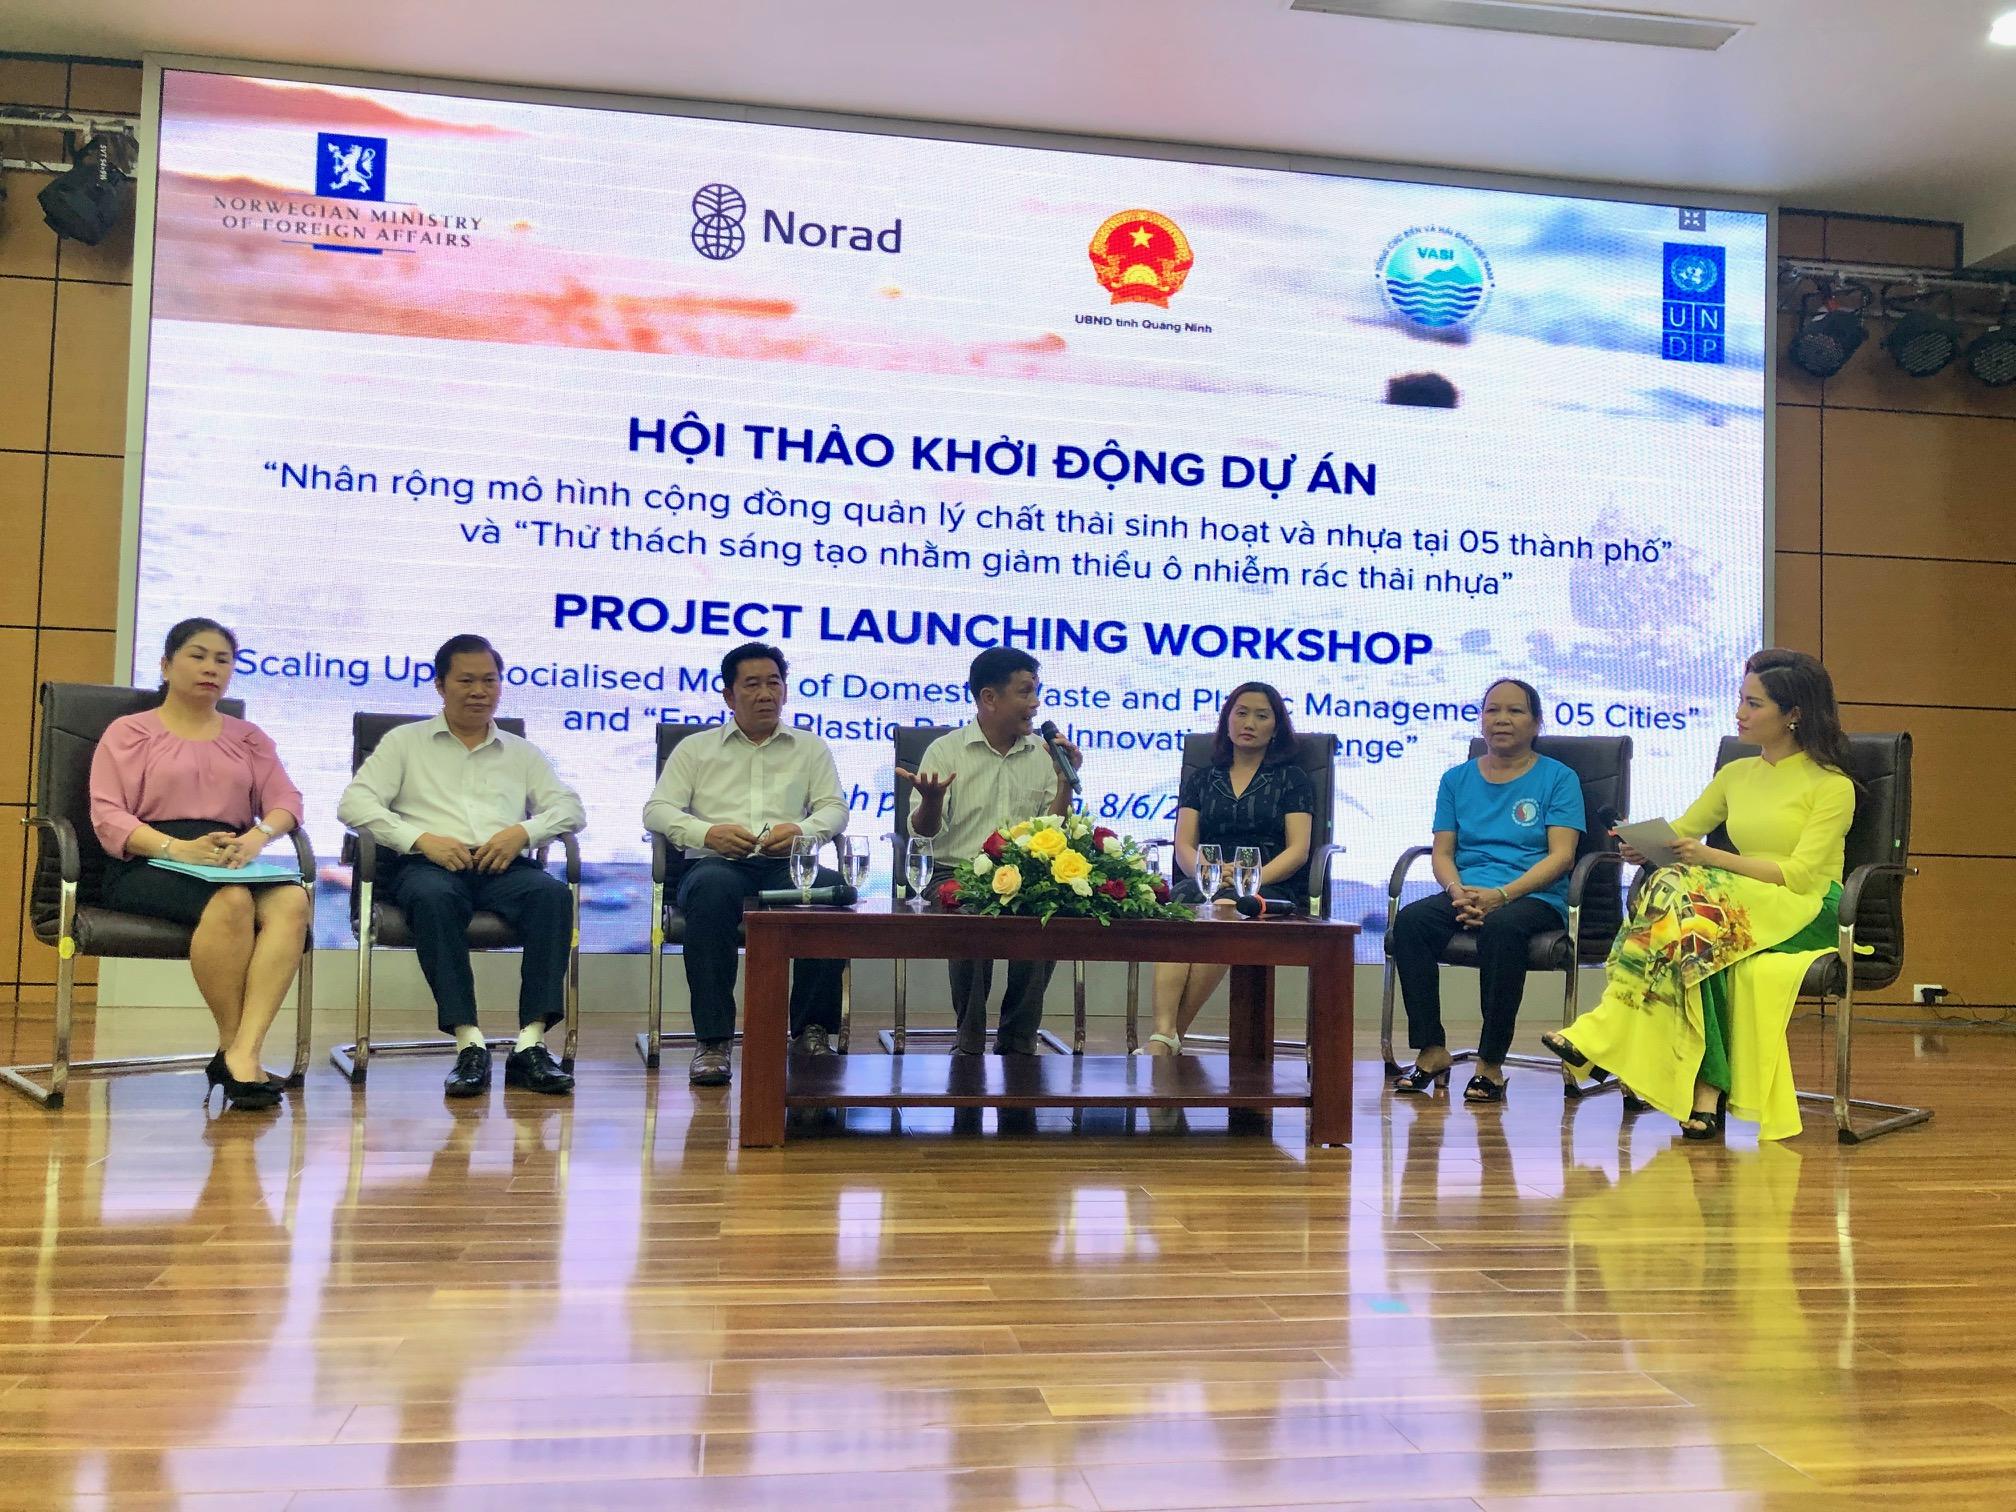 Vietnam joins Norway, UNDP in tackling waste, plastic pollution